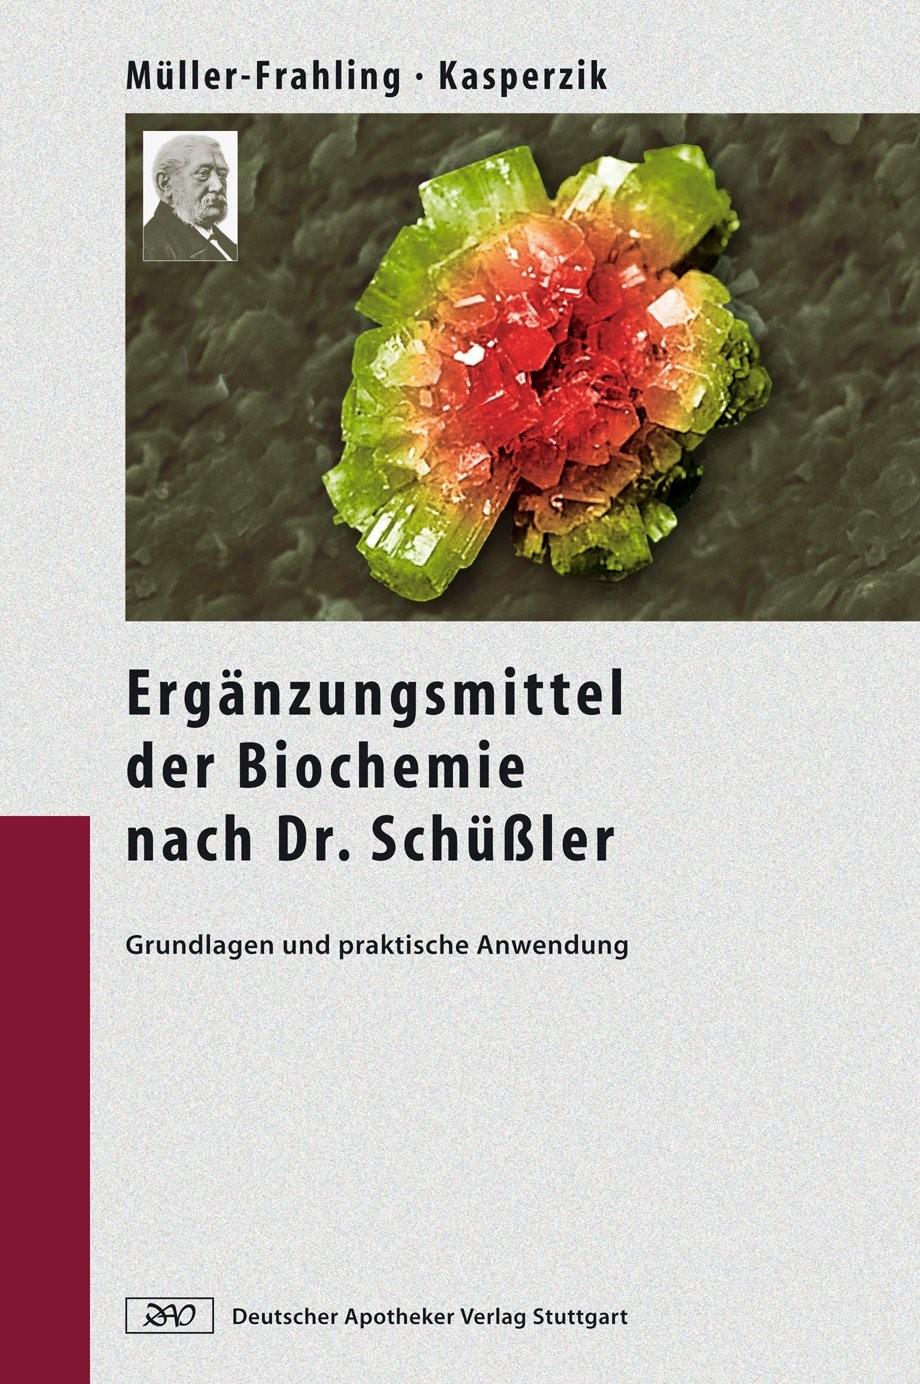 Die Ergänzungsmittel der Biochemie nach Dr. Schüßler | Müller-Frahling / Kasperzik, 2008 | Buch (Cover)